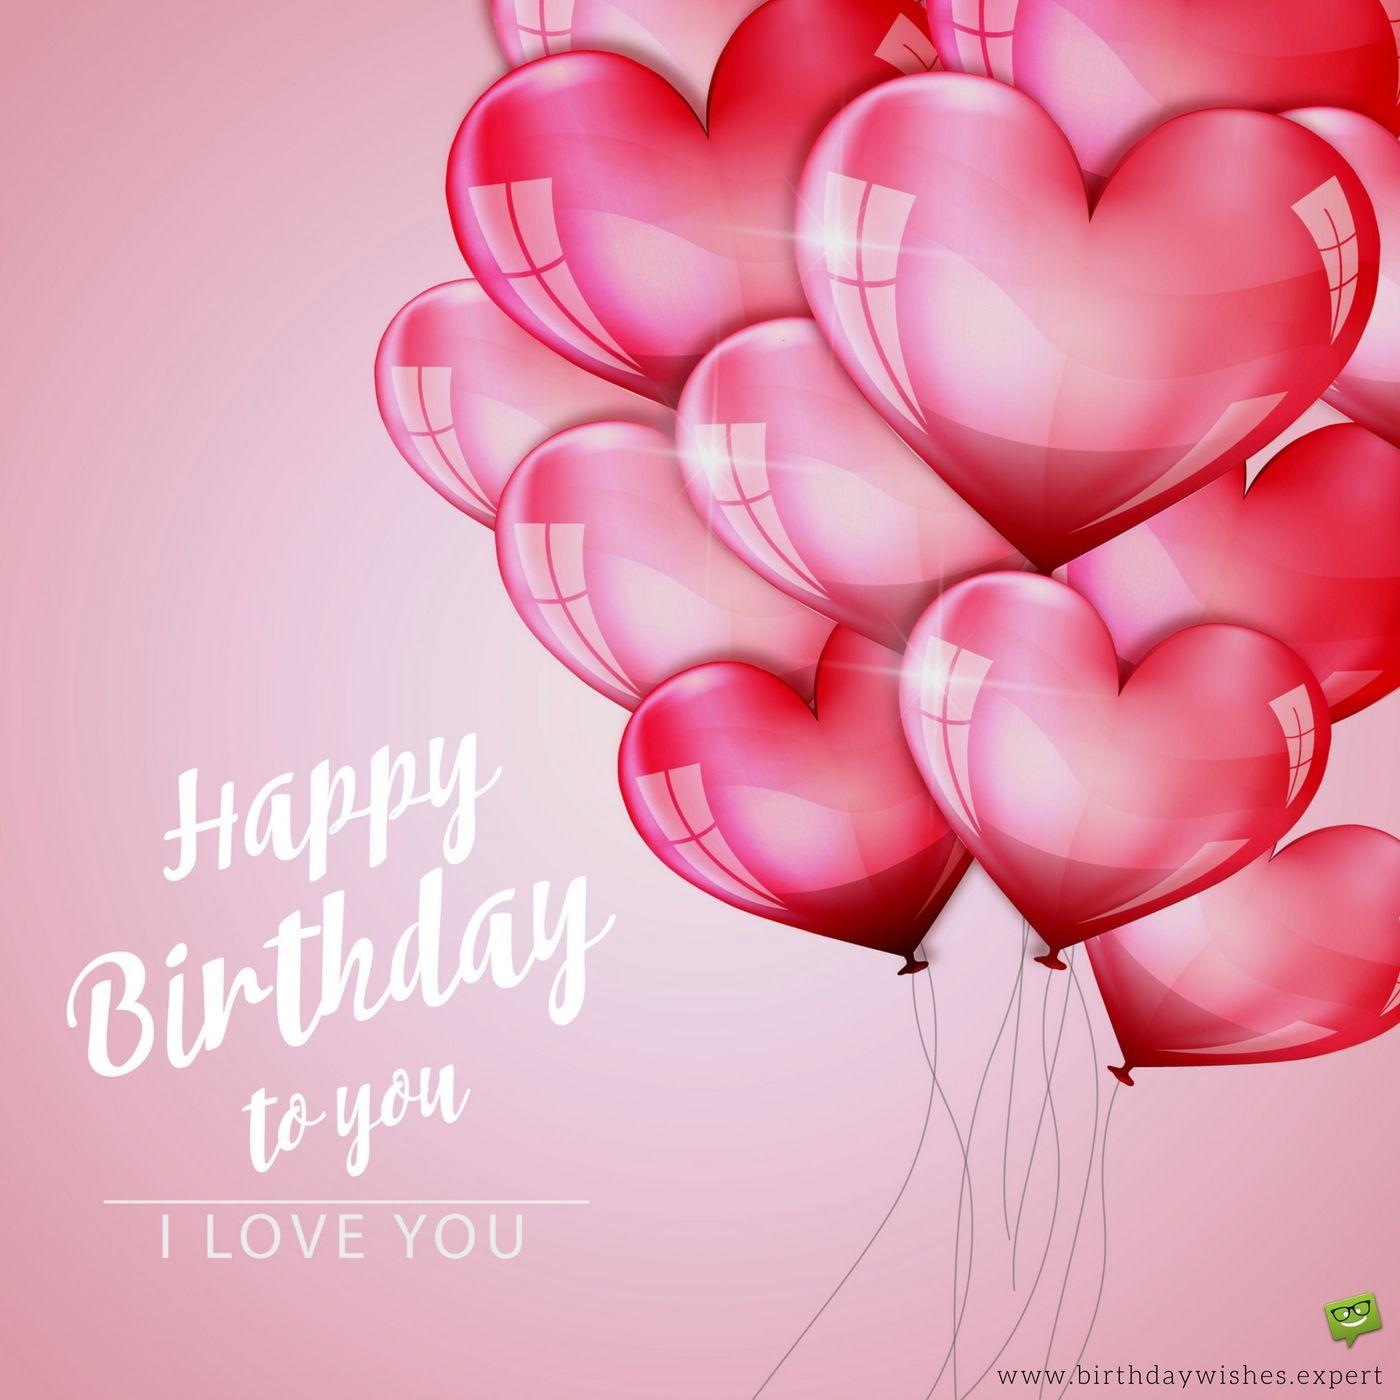 Happy Birthday to you I love you